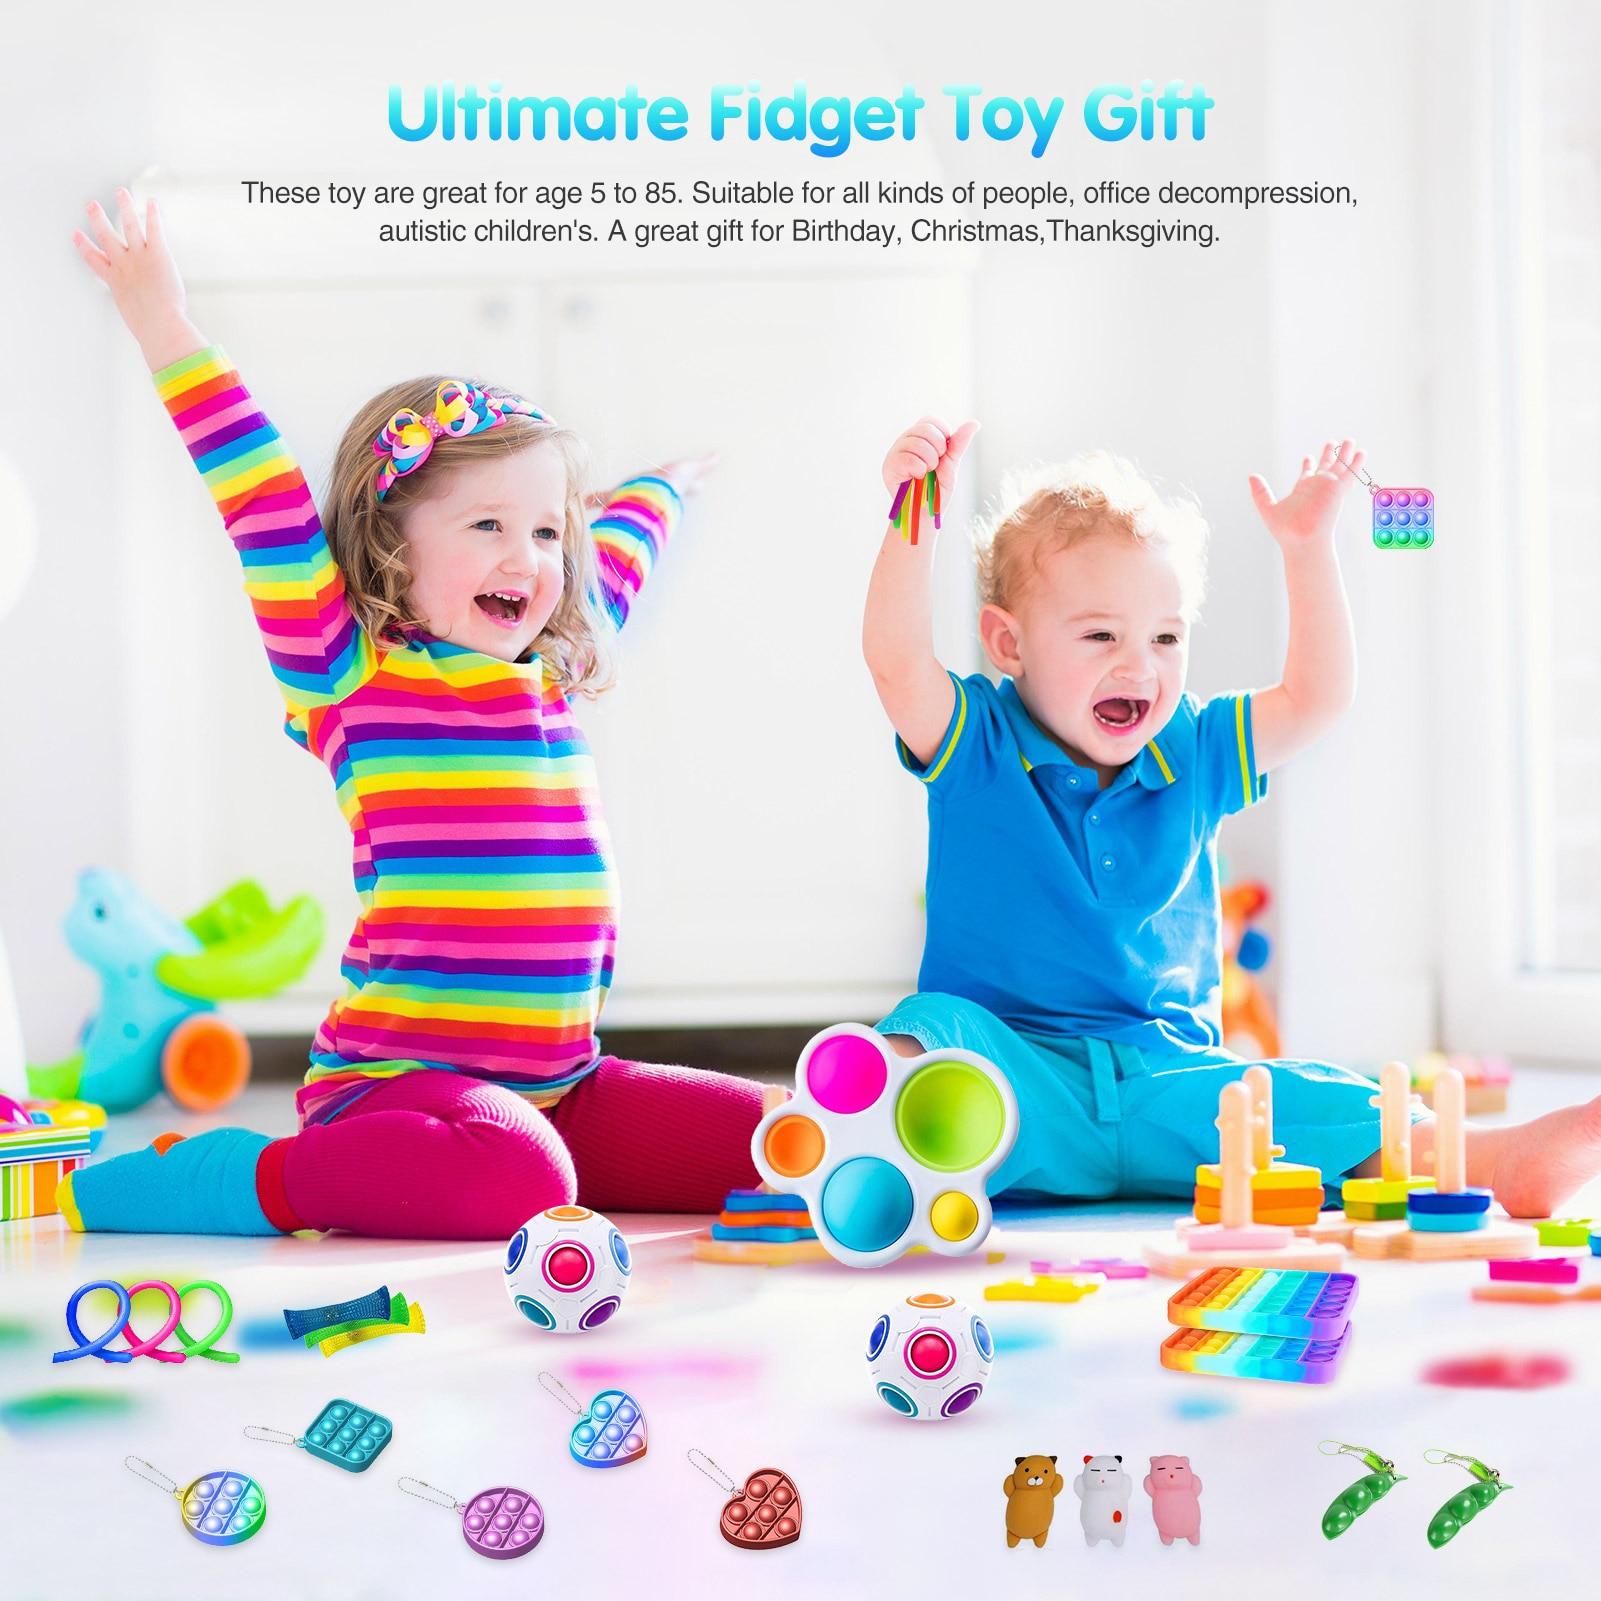 Toys-Set Fidget-Toys Decompression-Sensory Fun Squeeze Bubble Children's Cartoon Board-Game img2